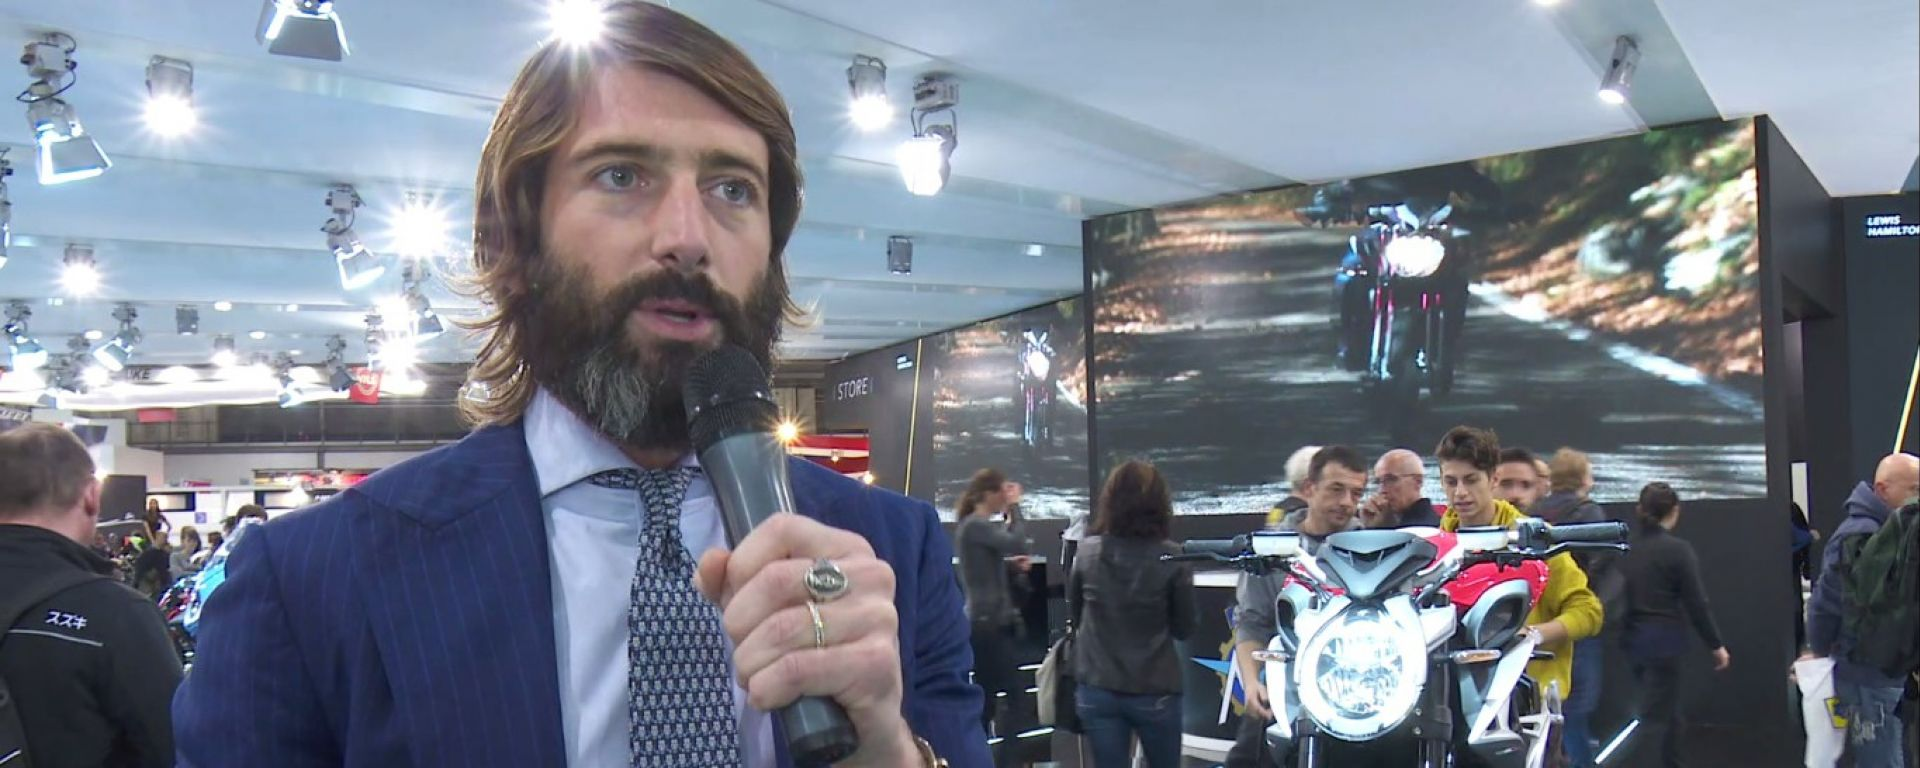 Eicma 2015 - notizie dalle Case: MV Agusta